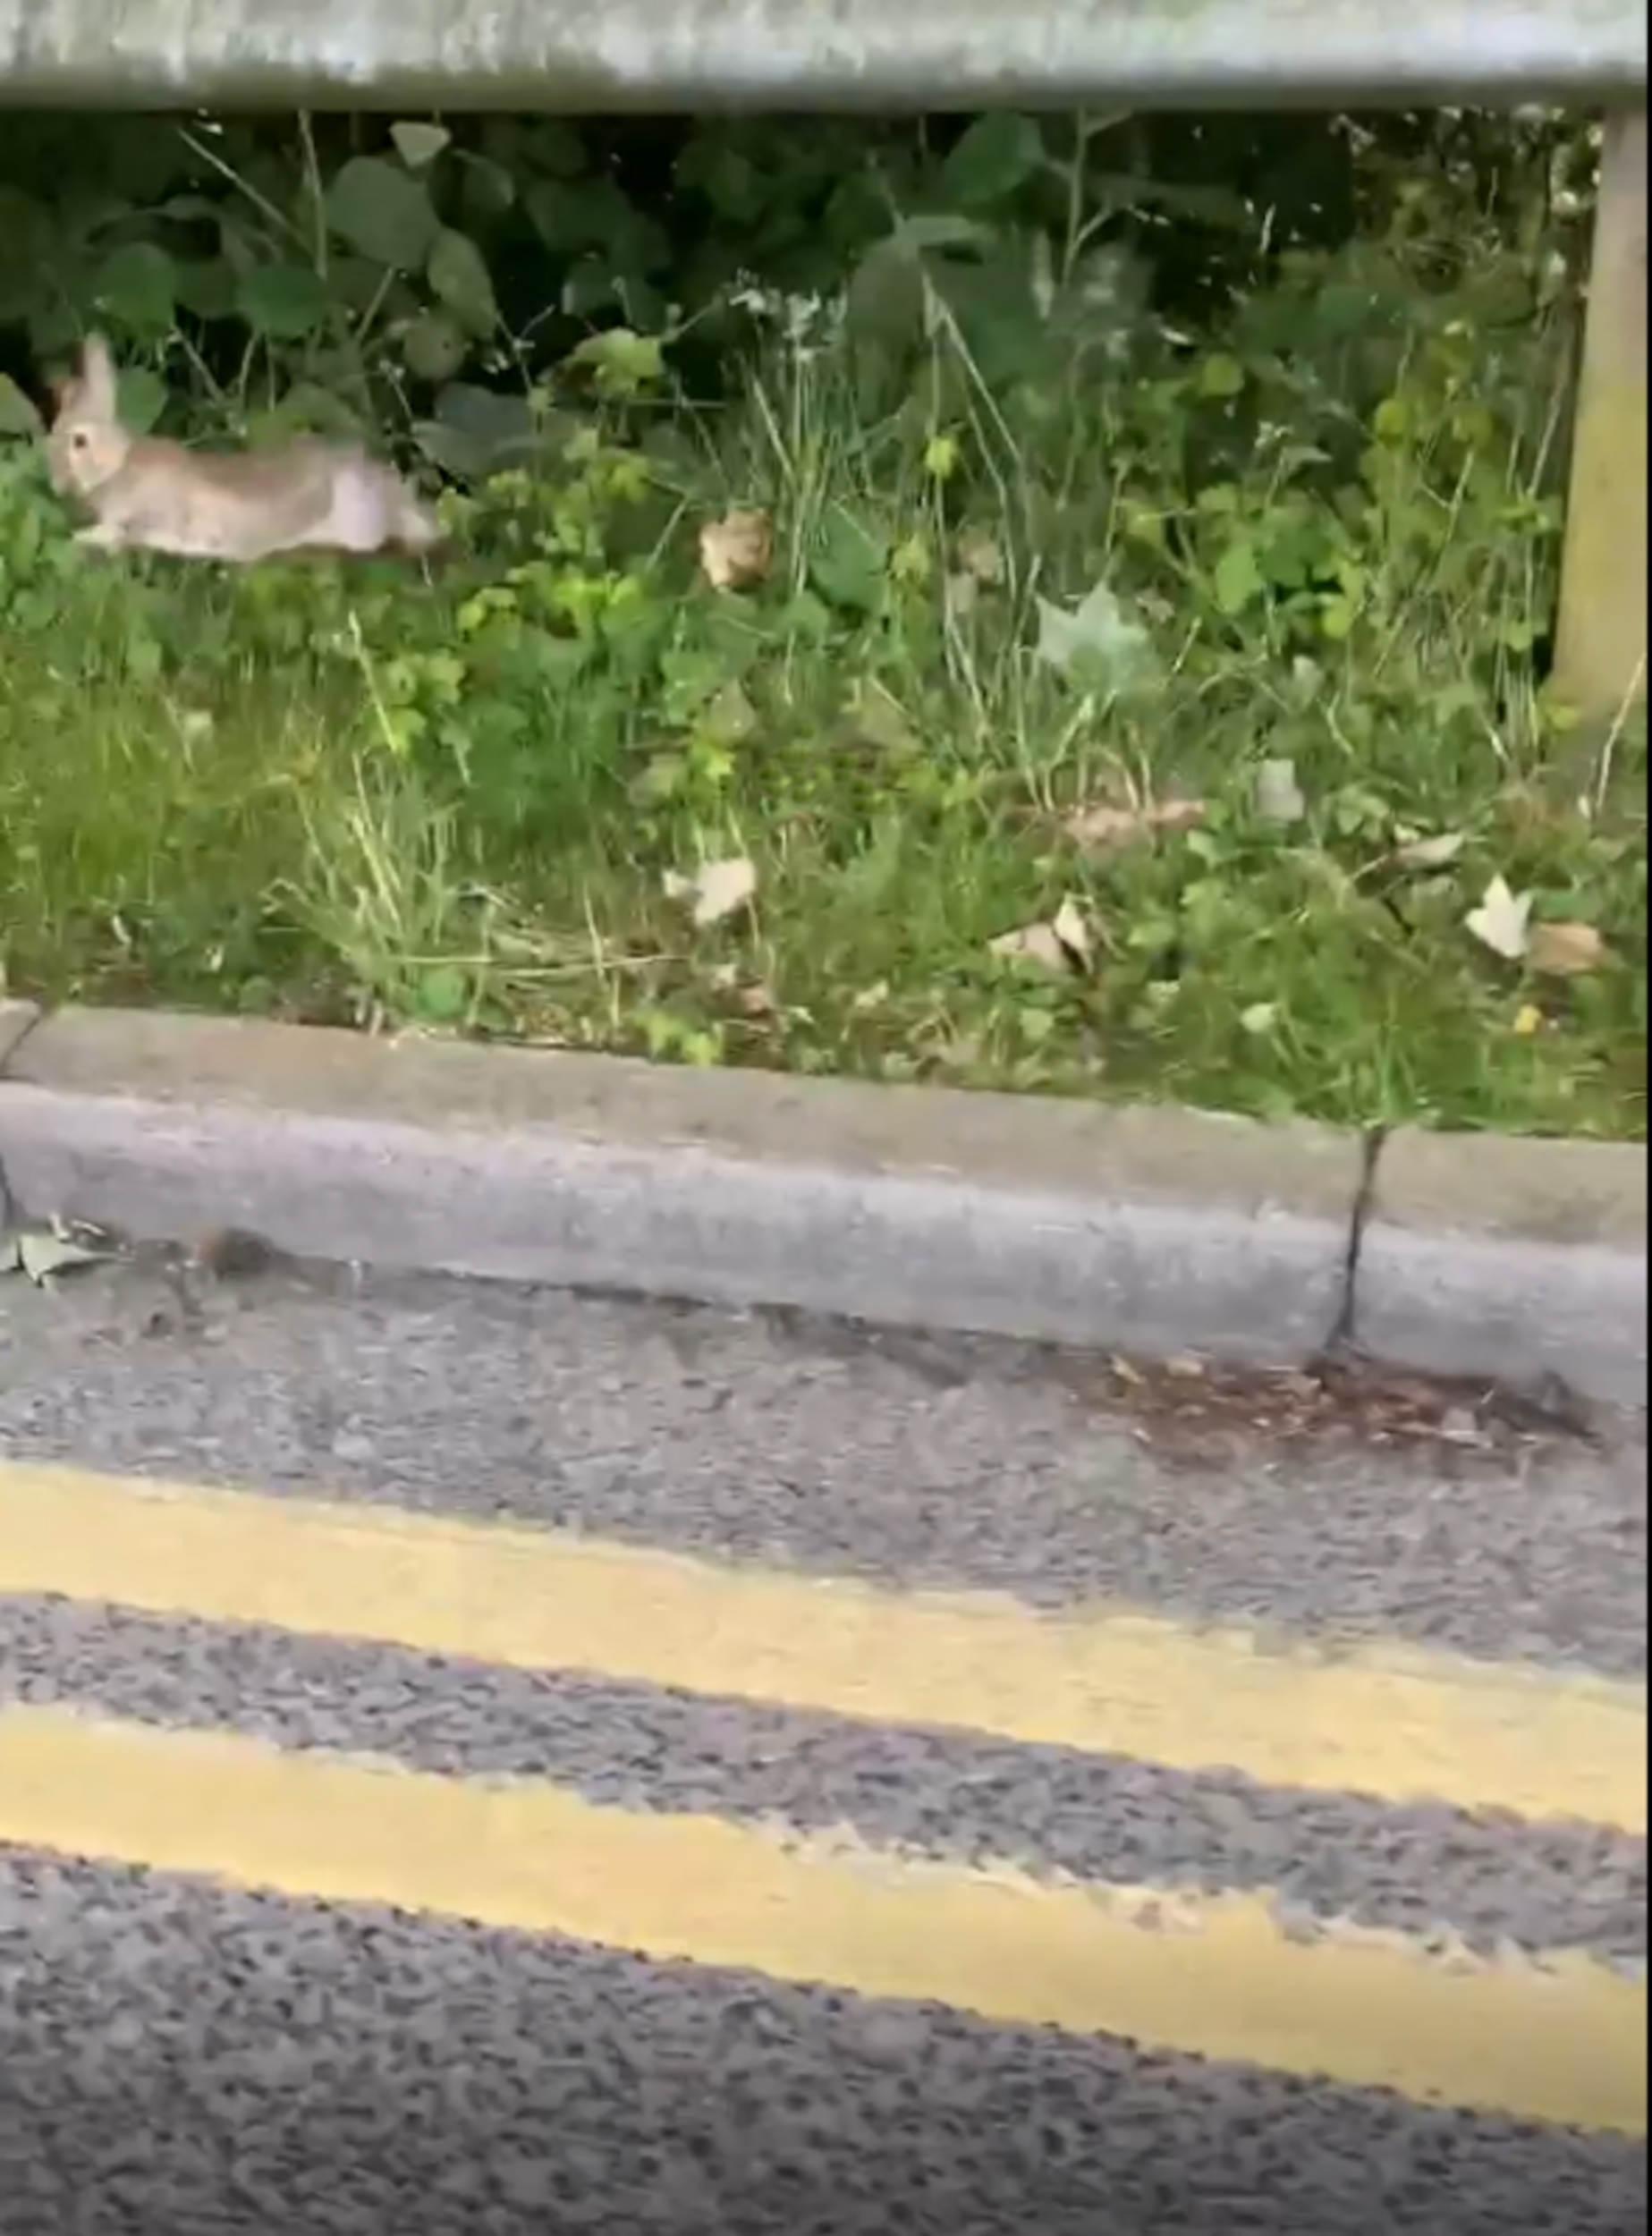 Rabbit escapes stoat - Wildlife News Scotland